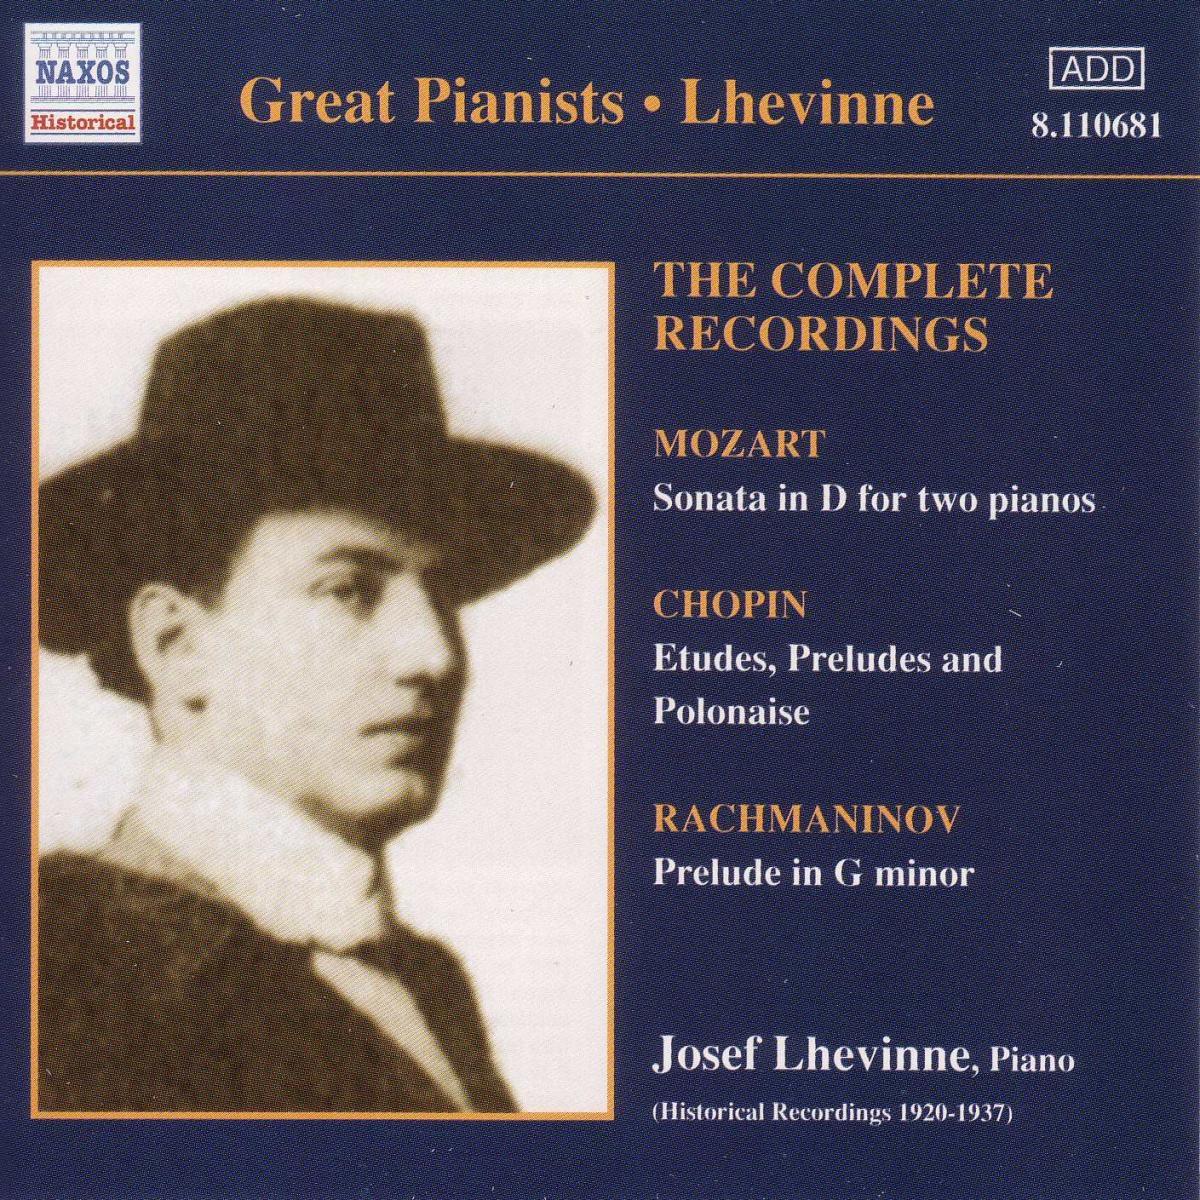 Great Pianists: Josef Lhevinne